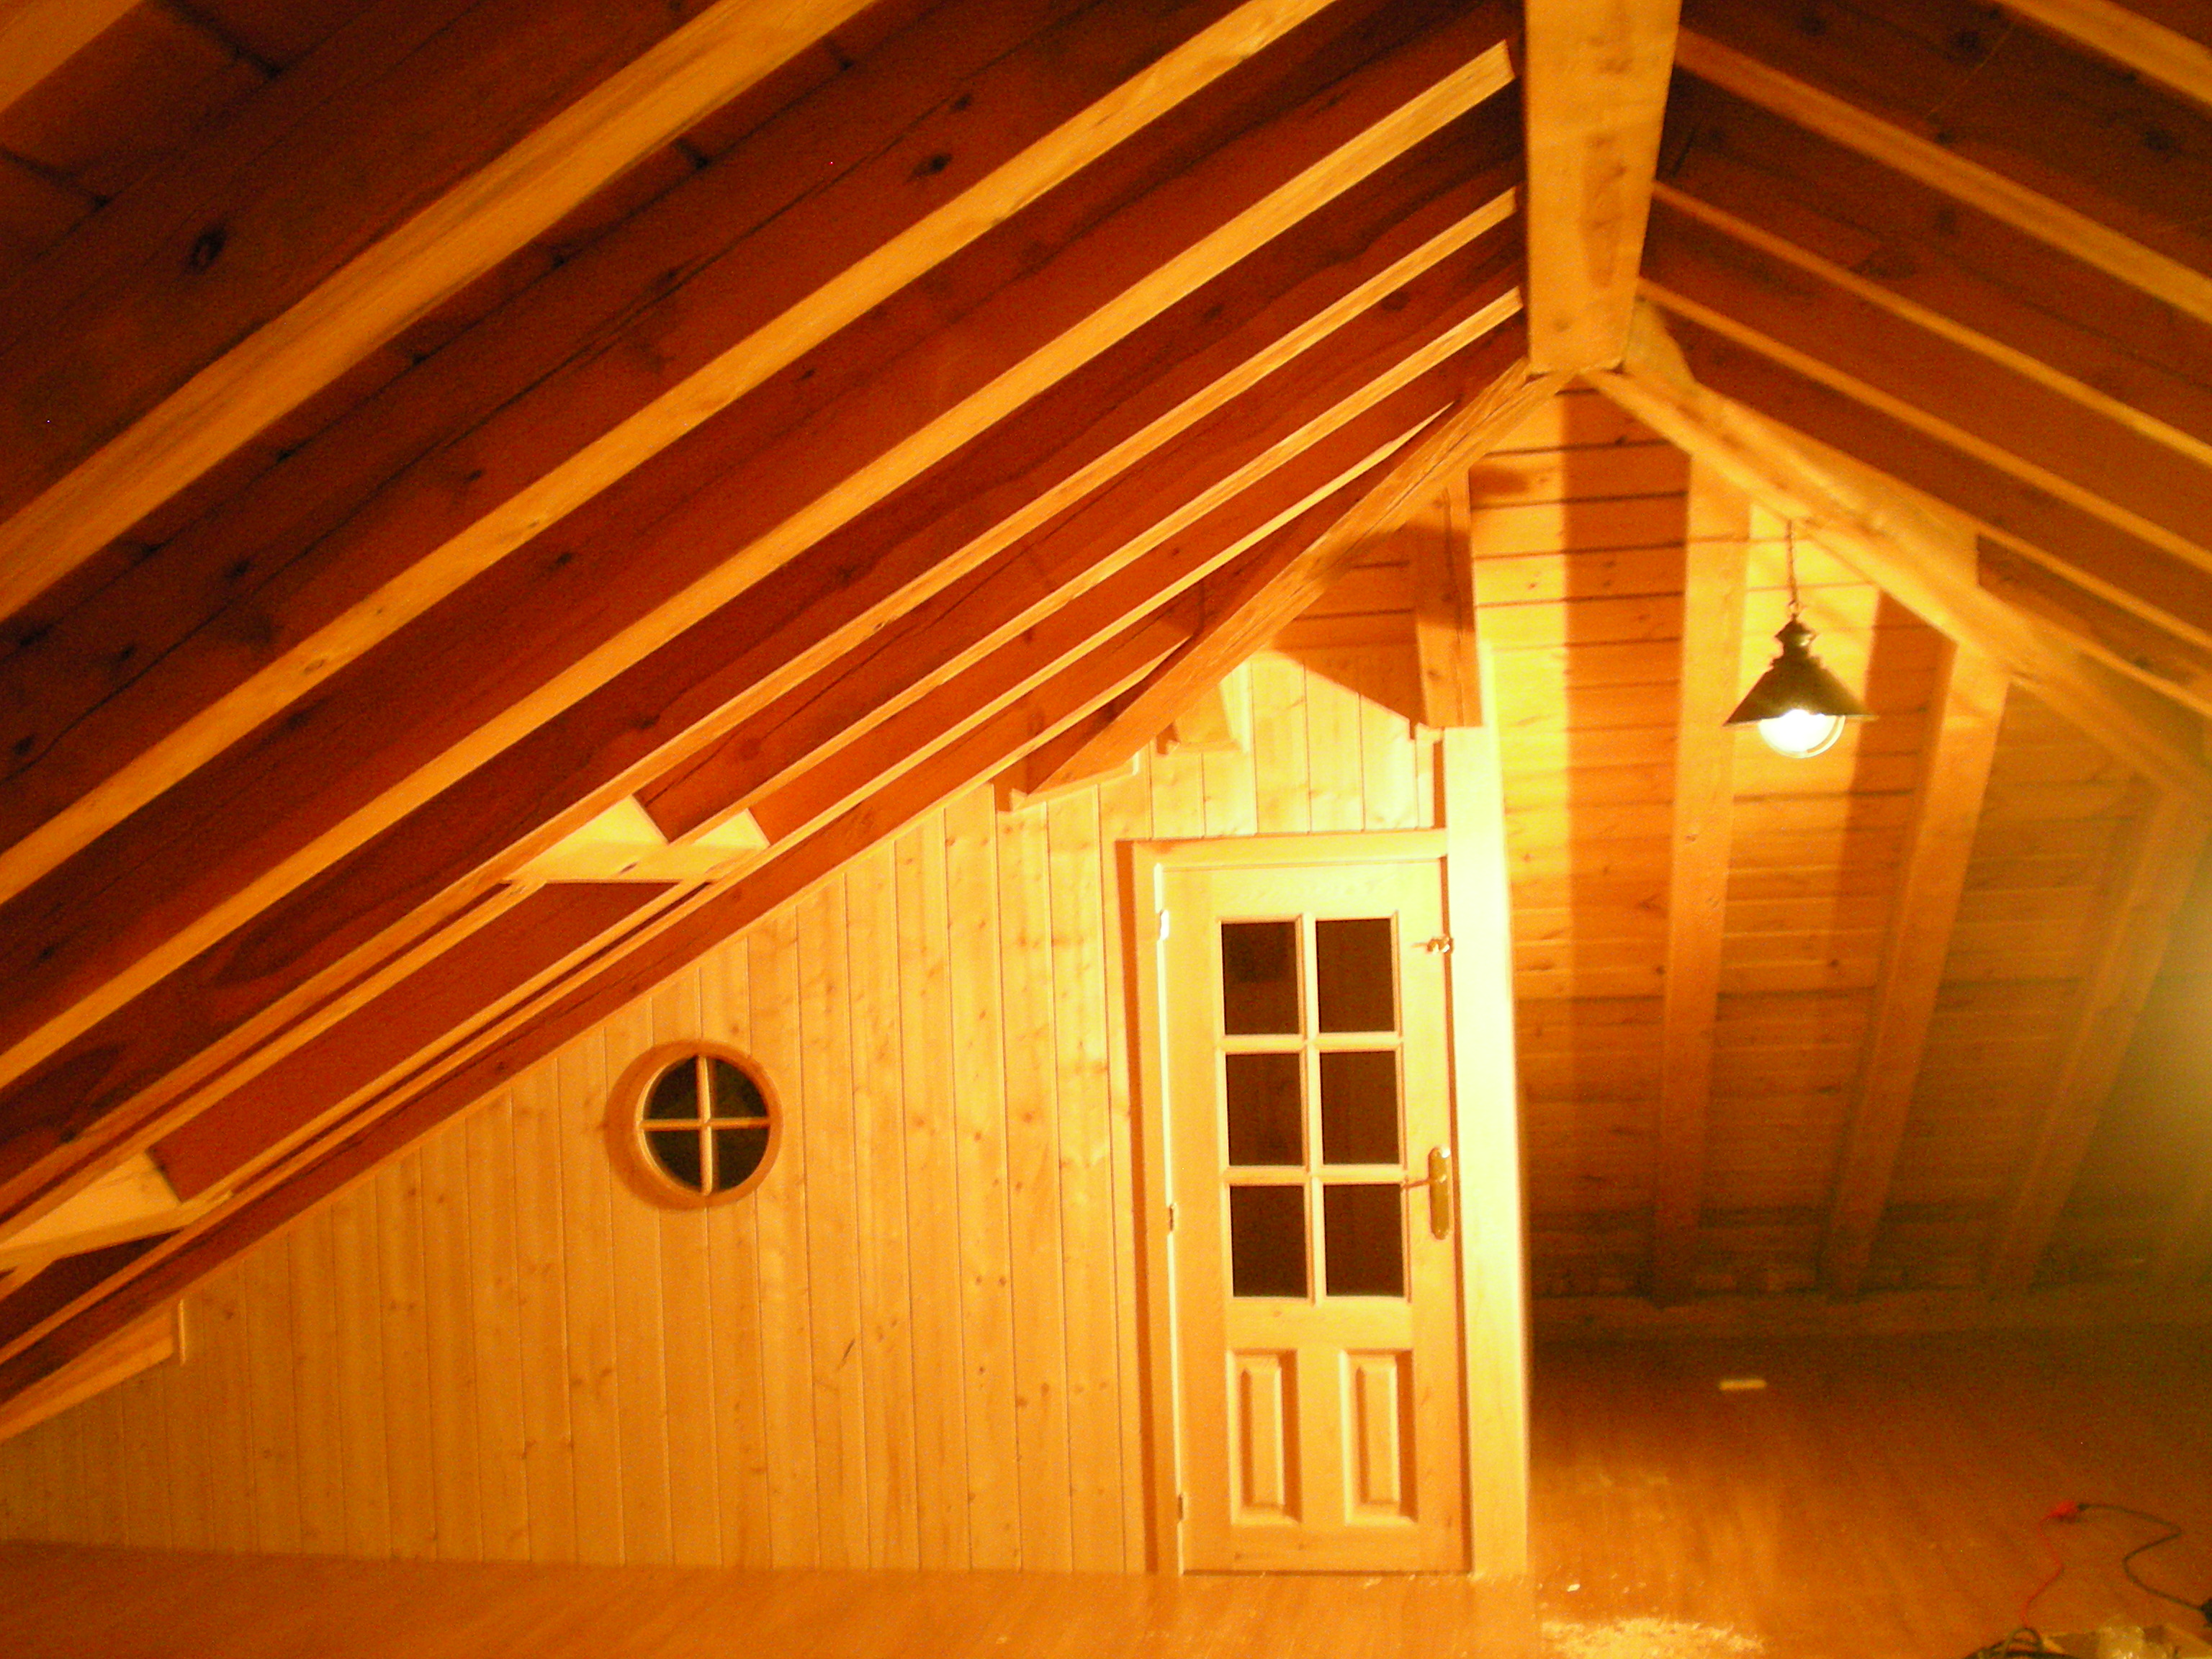 Falsos techos carpinter a de prado for Falsos techos de madera